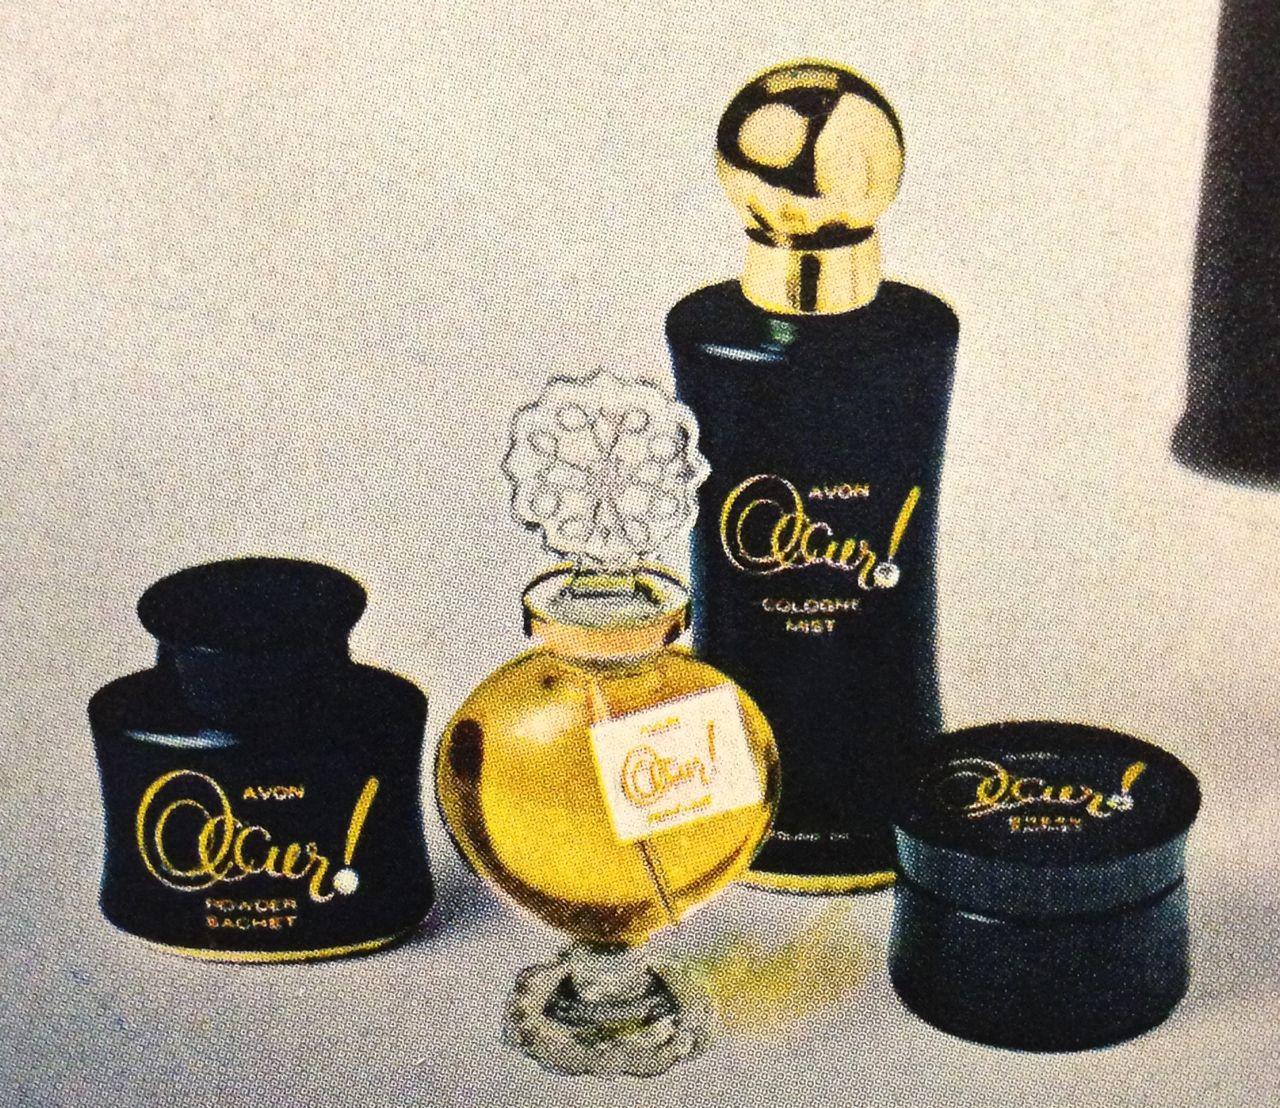 Avon Occur Fragrance Line 1963 Avon Avon Perfume Avon